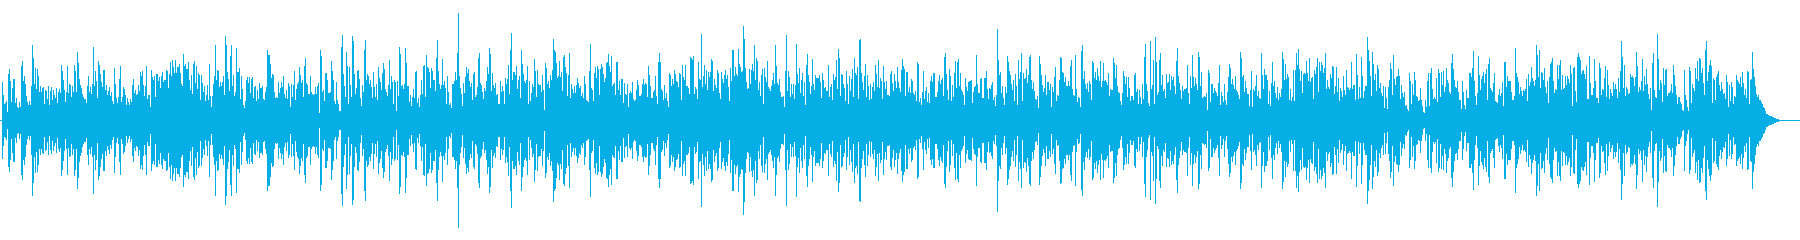 JAZZ|上品でエレガントなジャズBGMの再生済みの波形